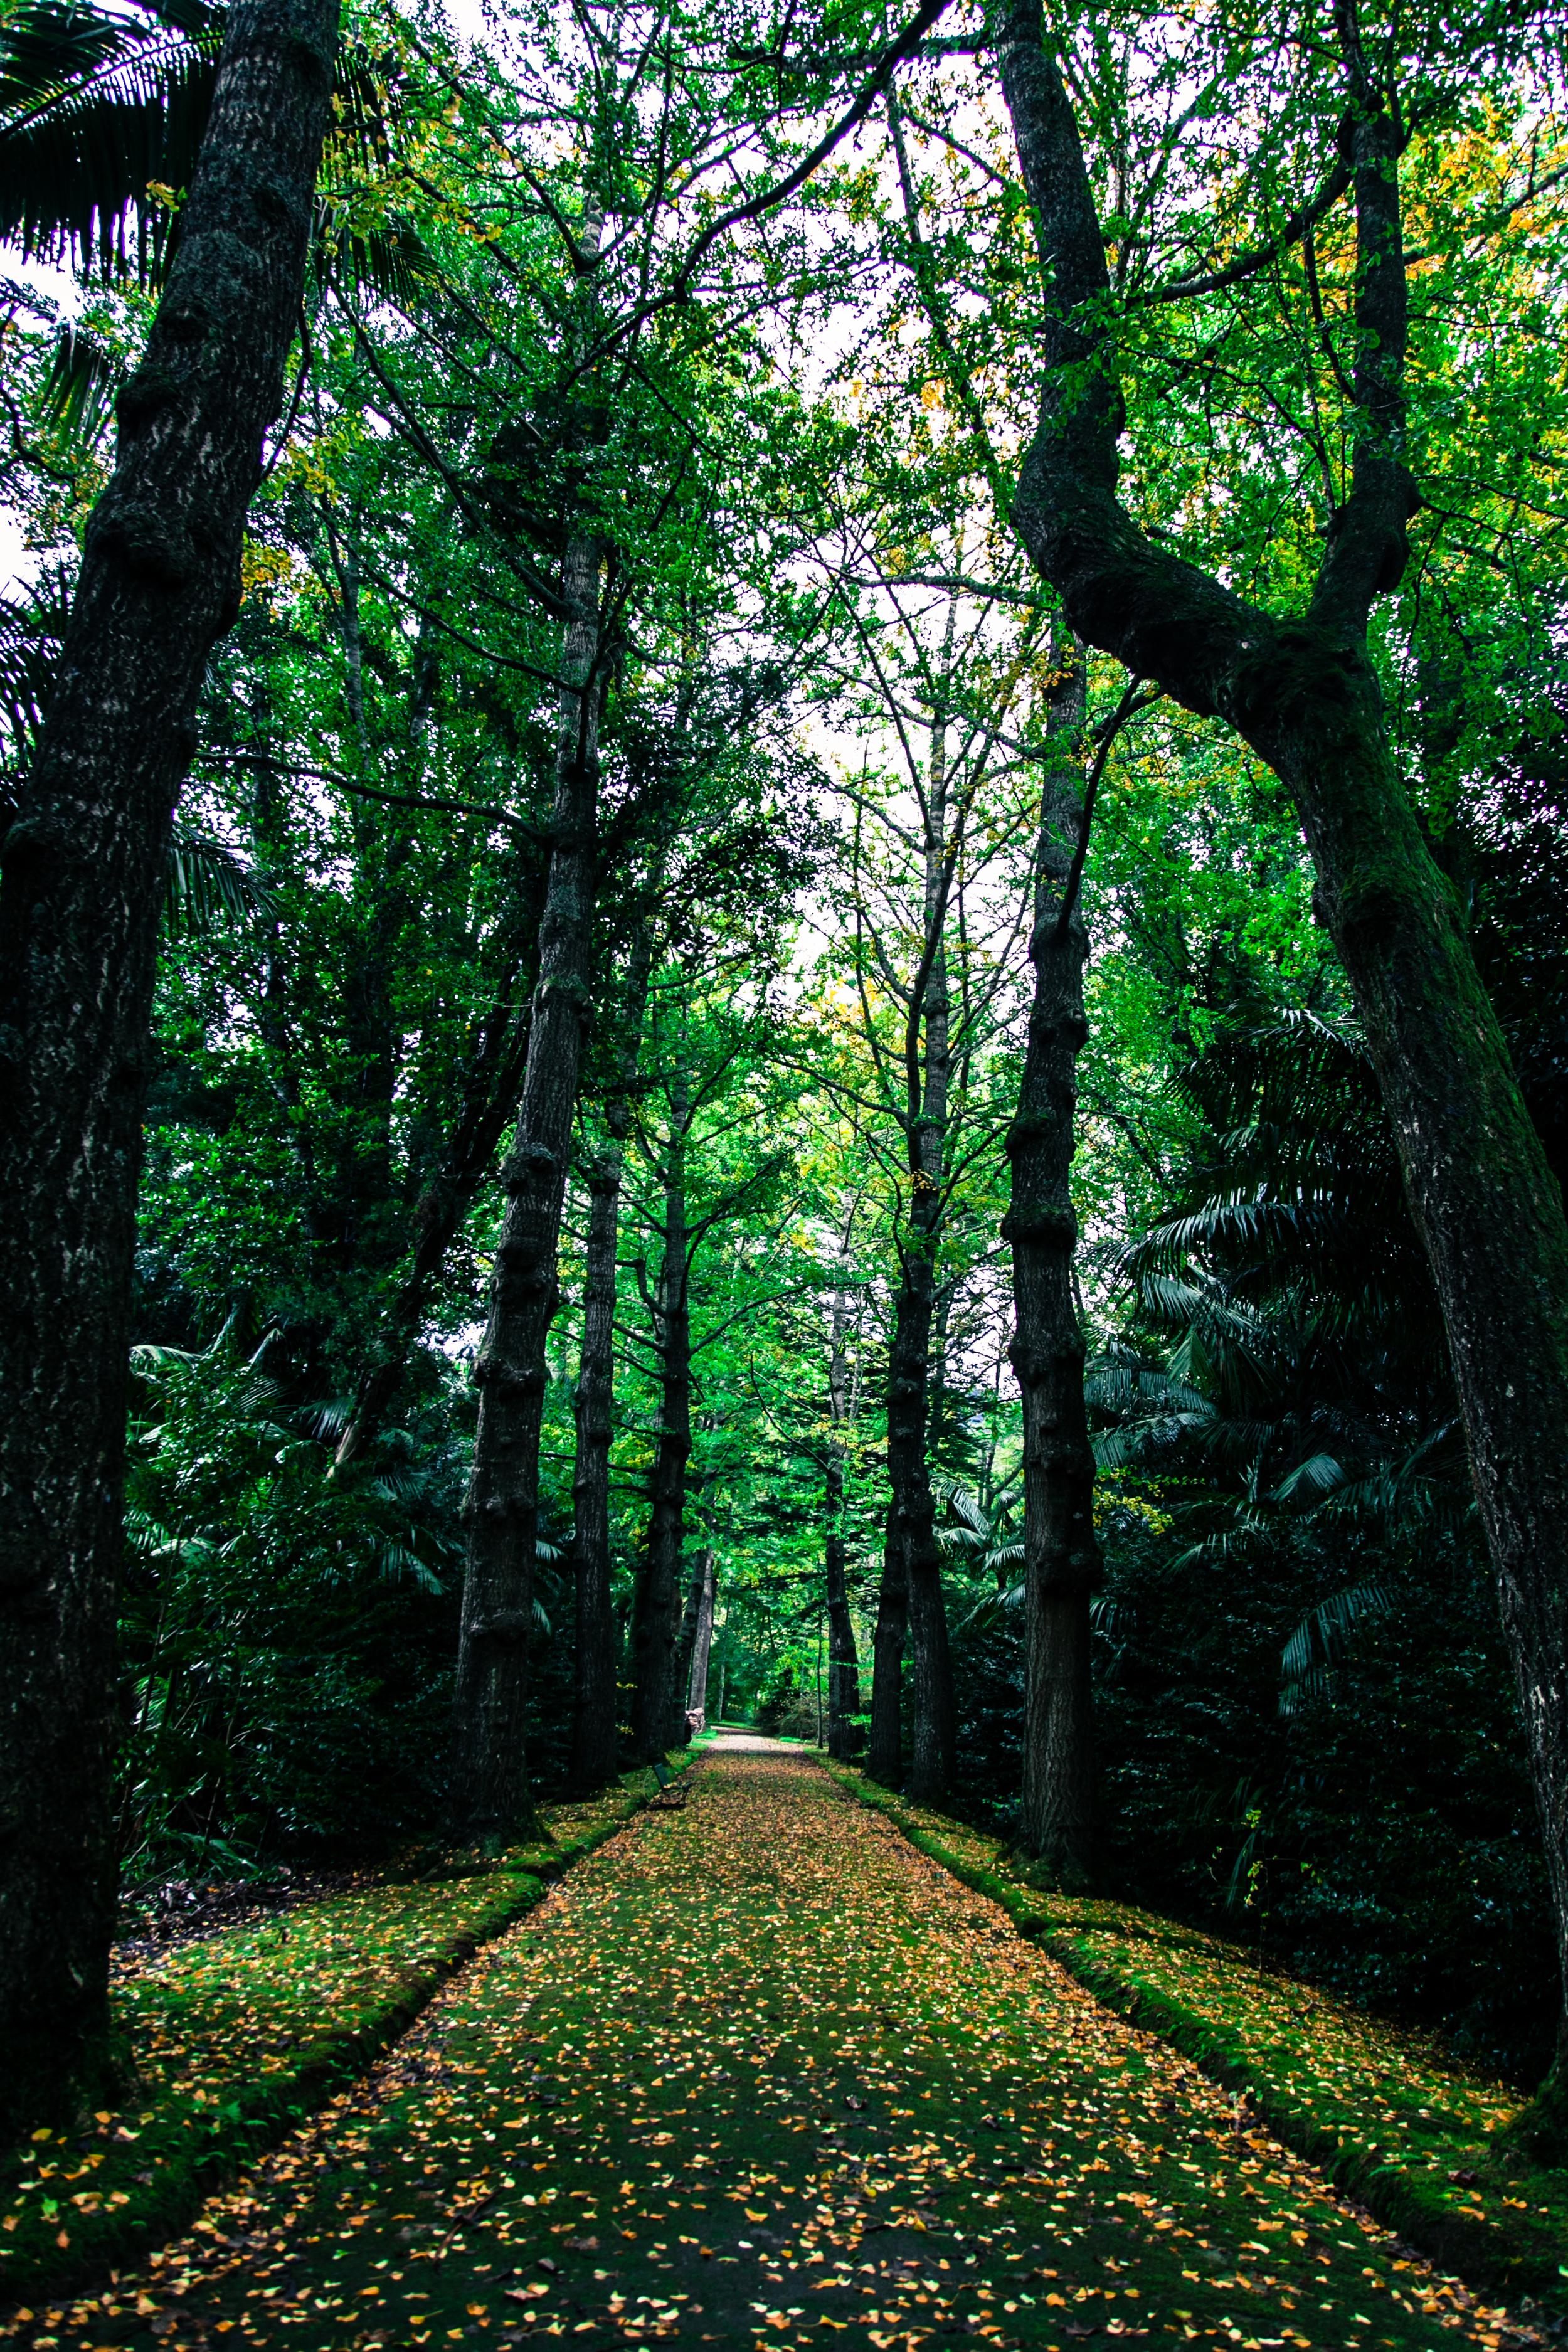 Autumn_2014_KH-1.jpg